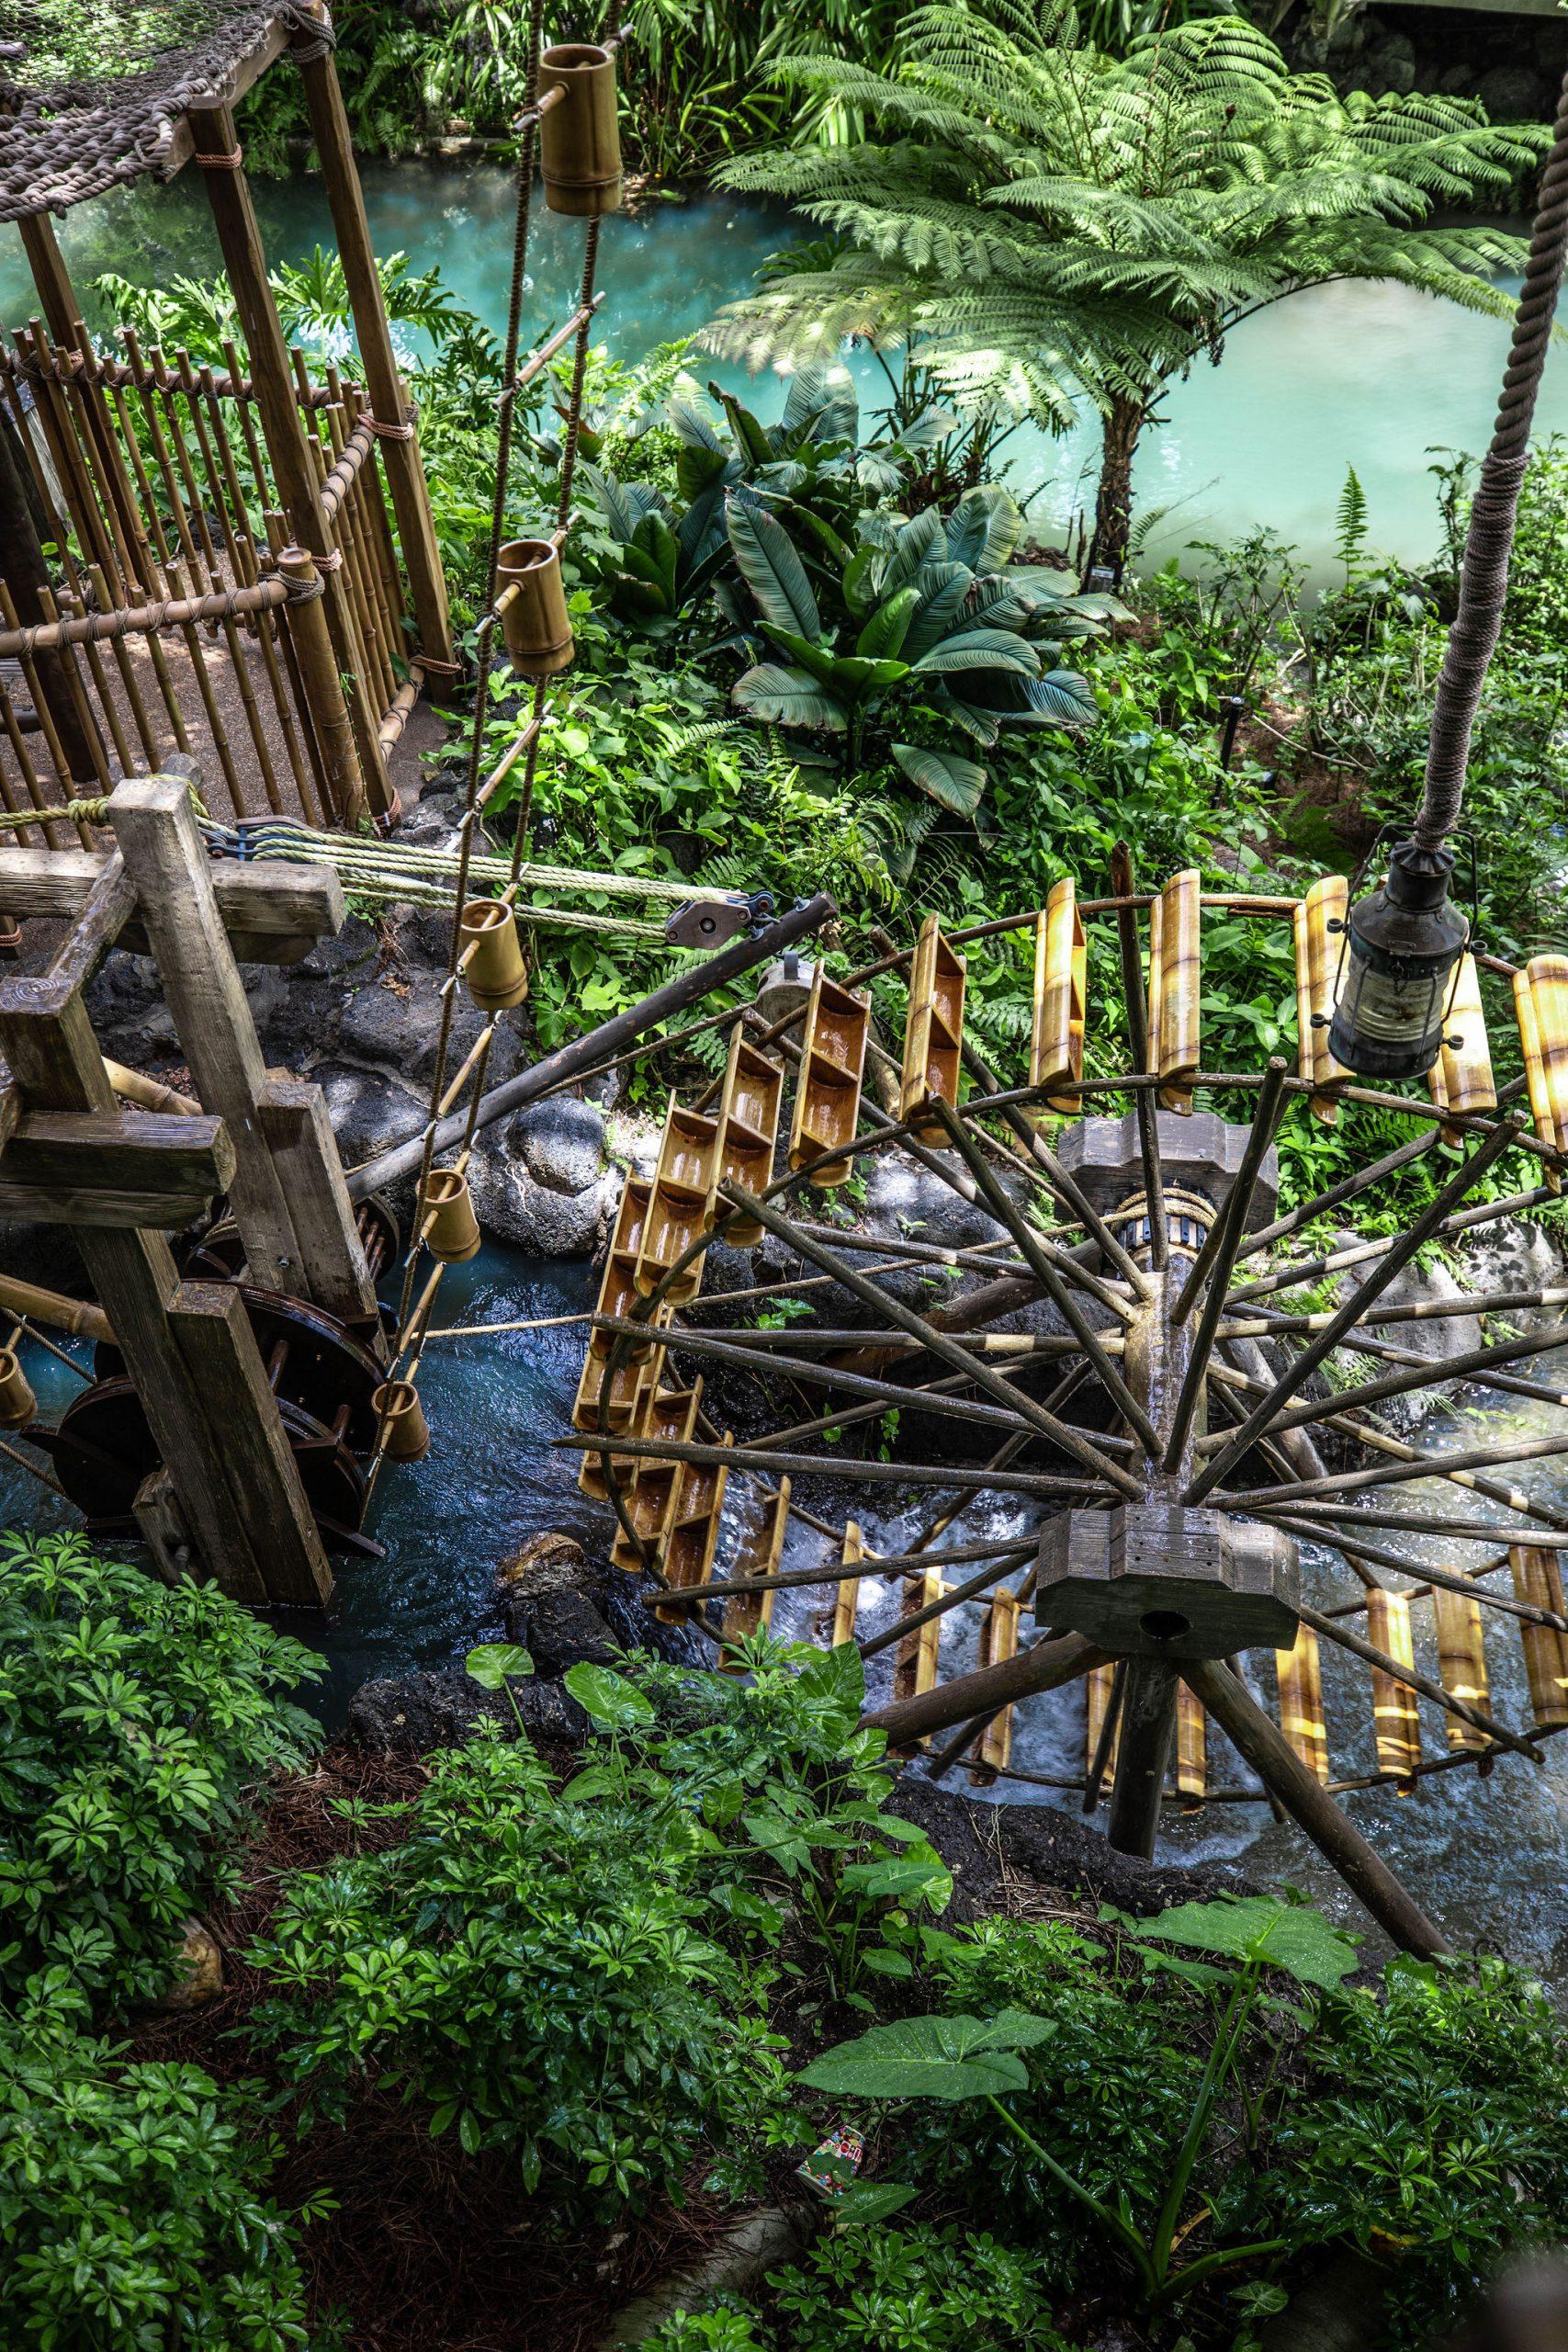 Swiss Family Robinson Treehouse Ride at Magic Kingdom Walt Disney World Photographed by Annie Fairfax